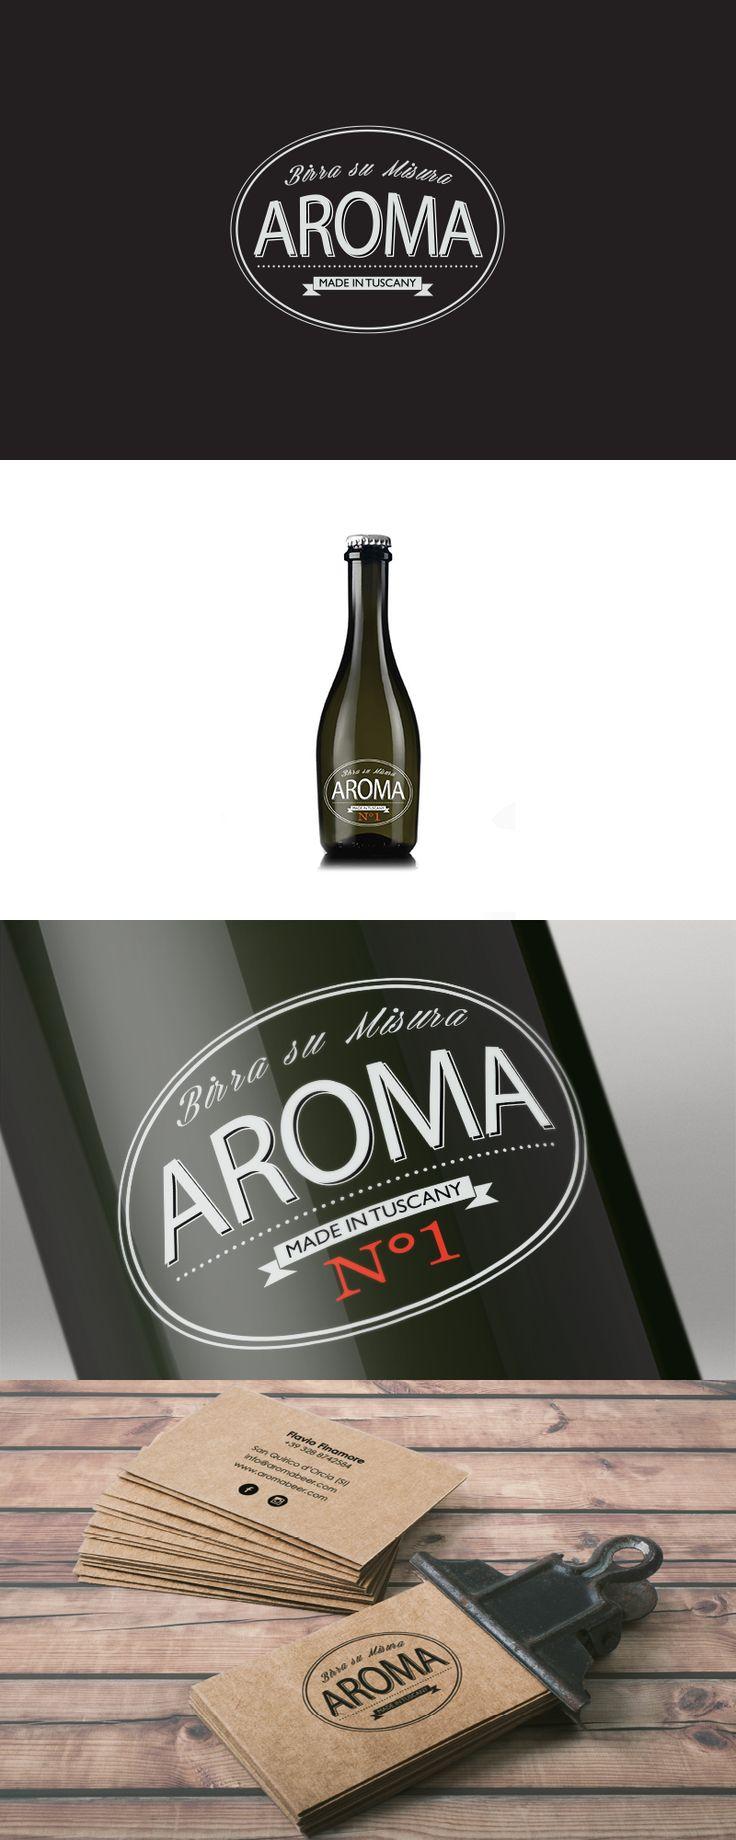 Aroma, Label Design ─ Giulio Patrizi Design Agency ©     #label #design #beer